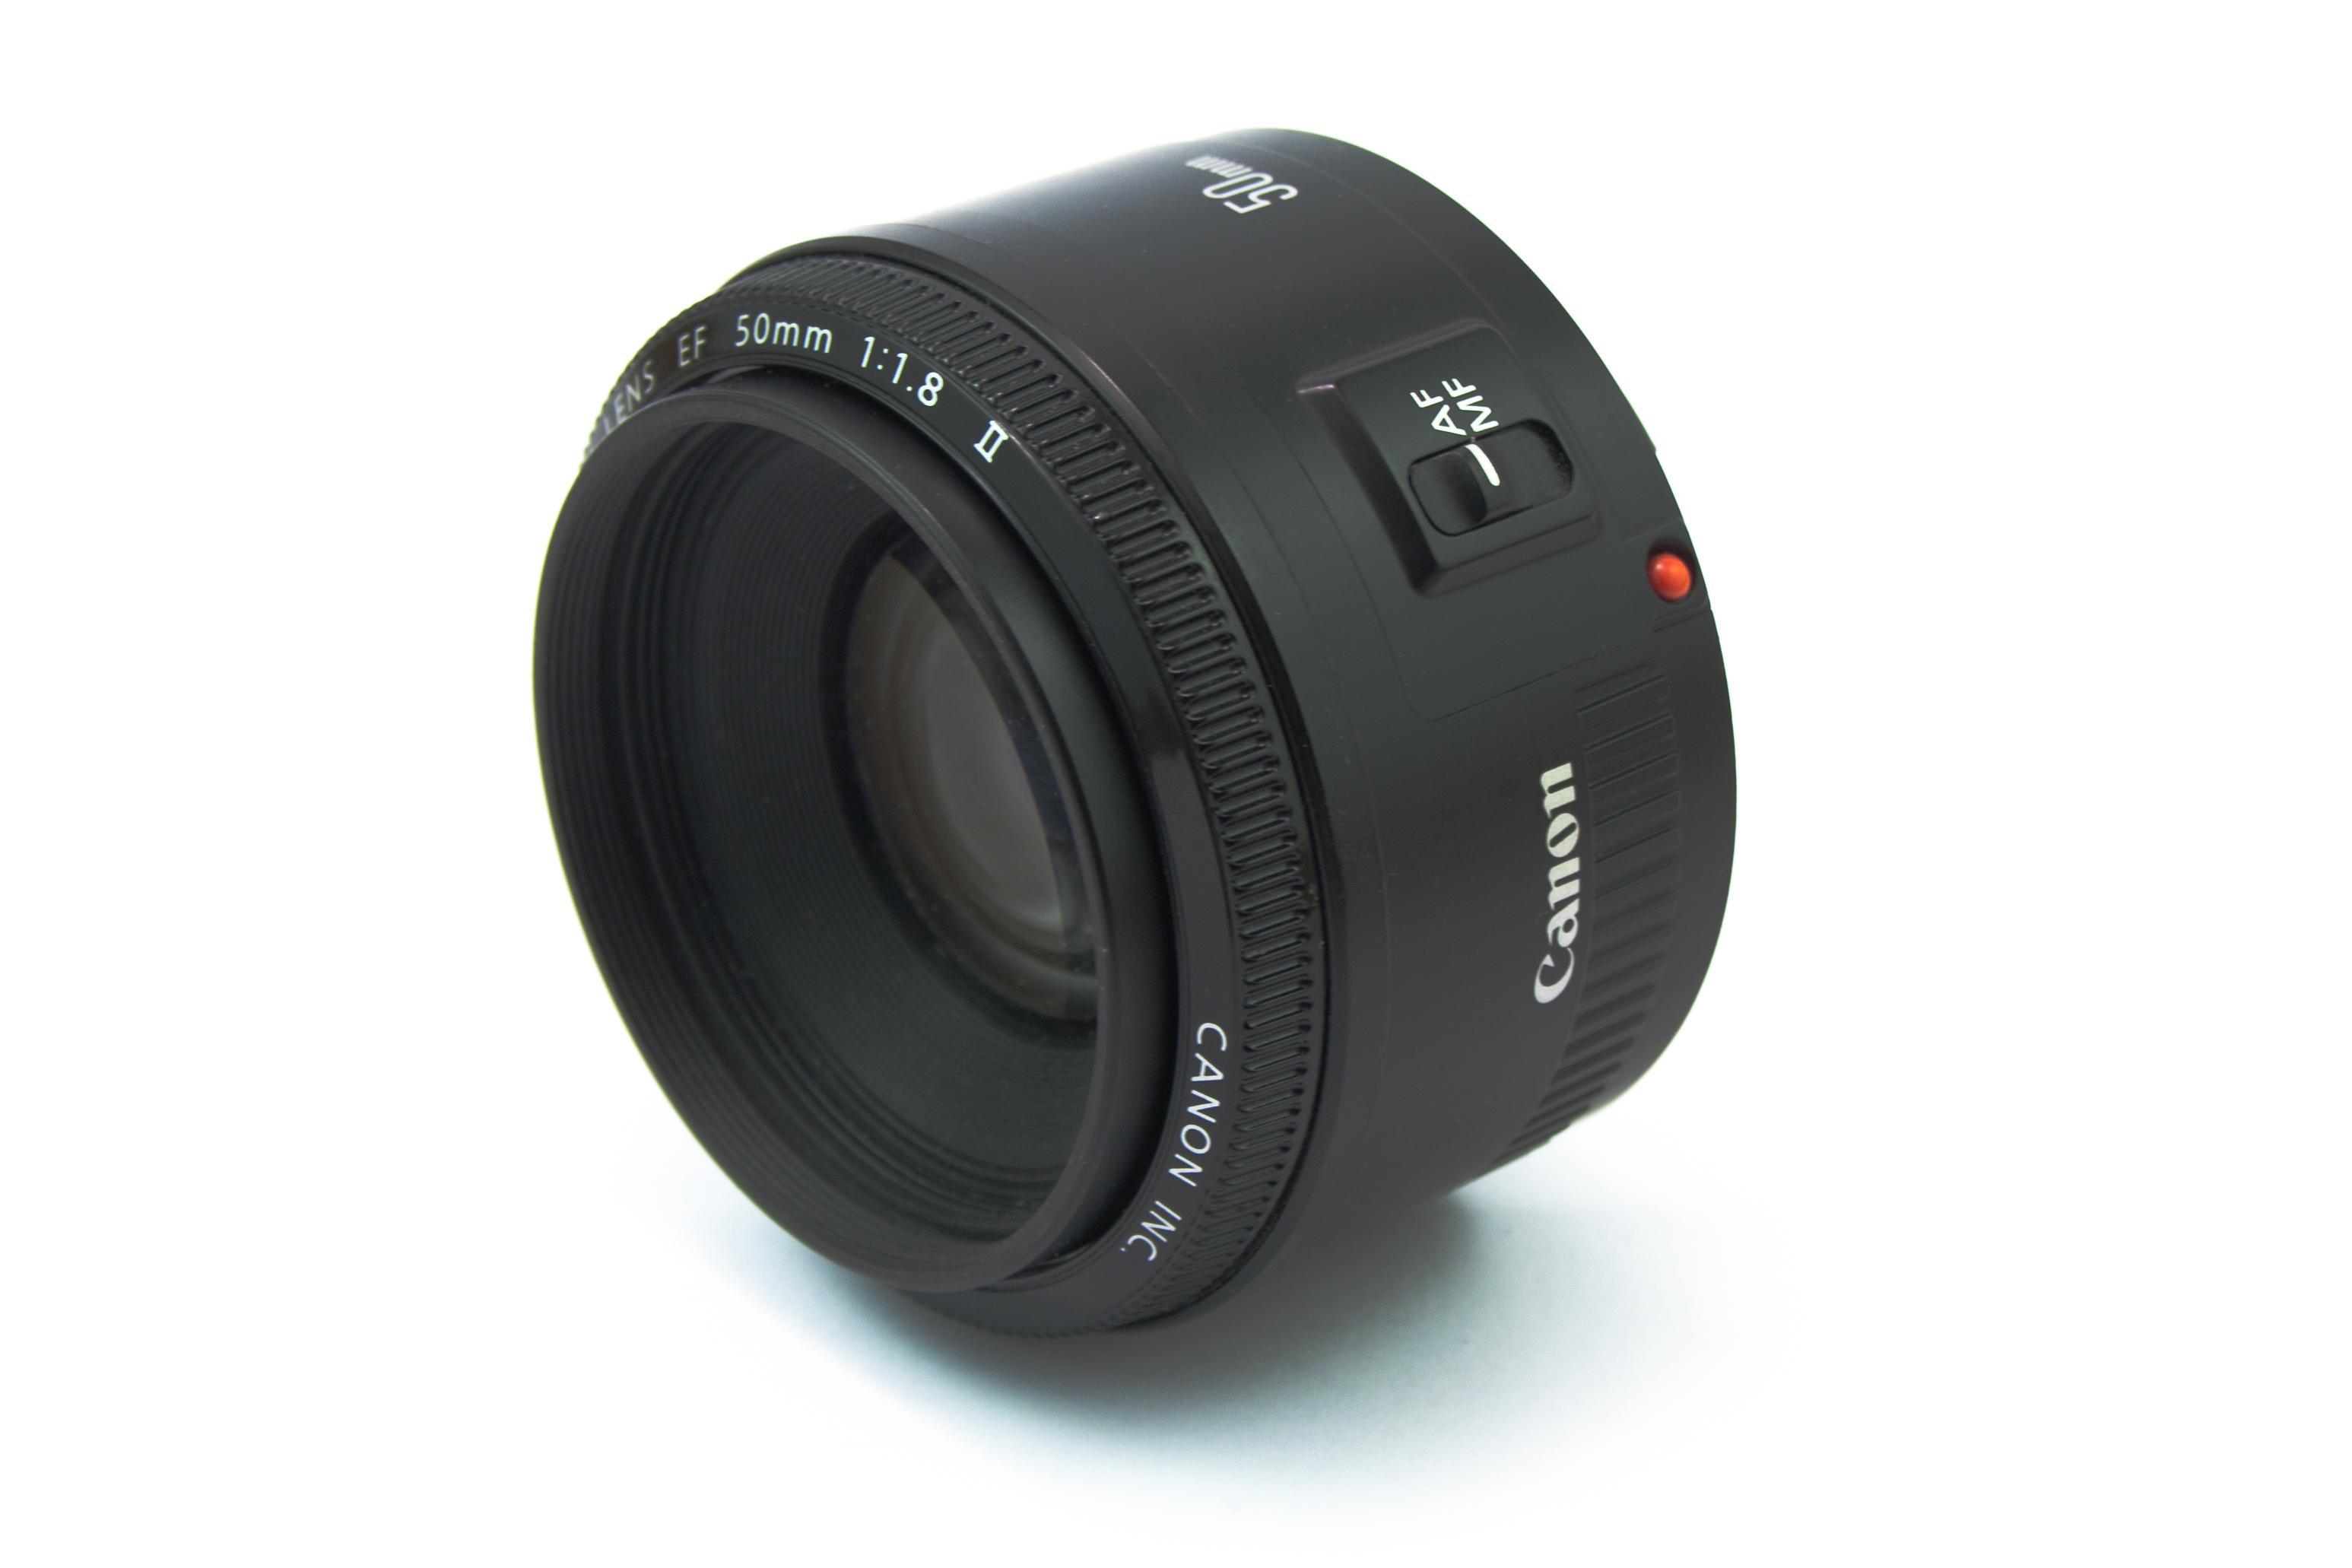 Canon_EF_50_mm_f_1.8_II